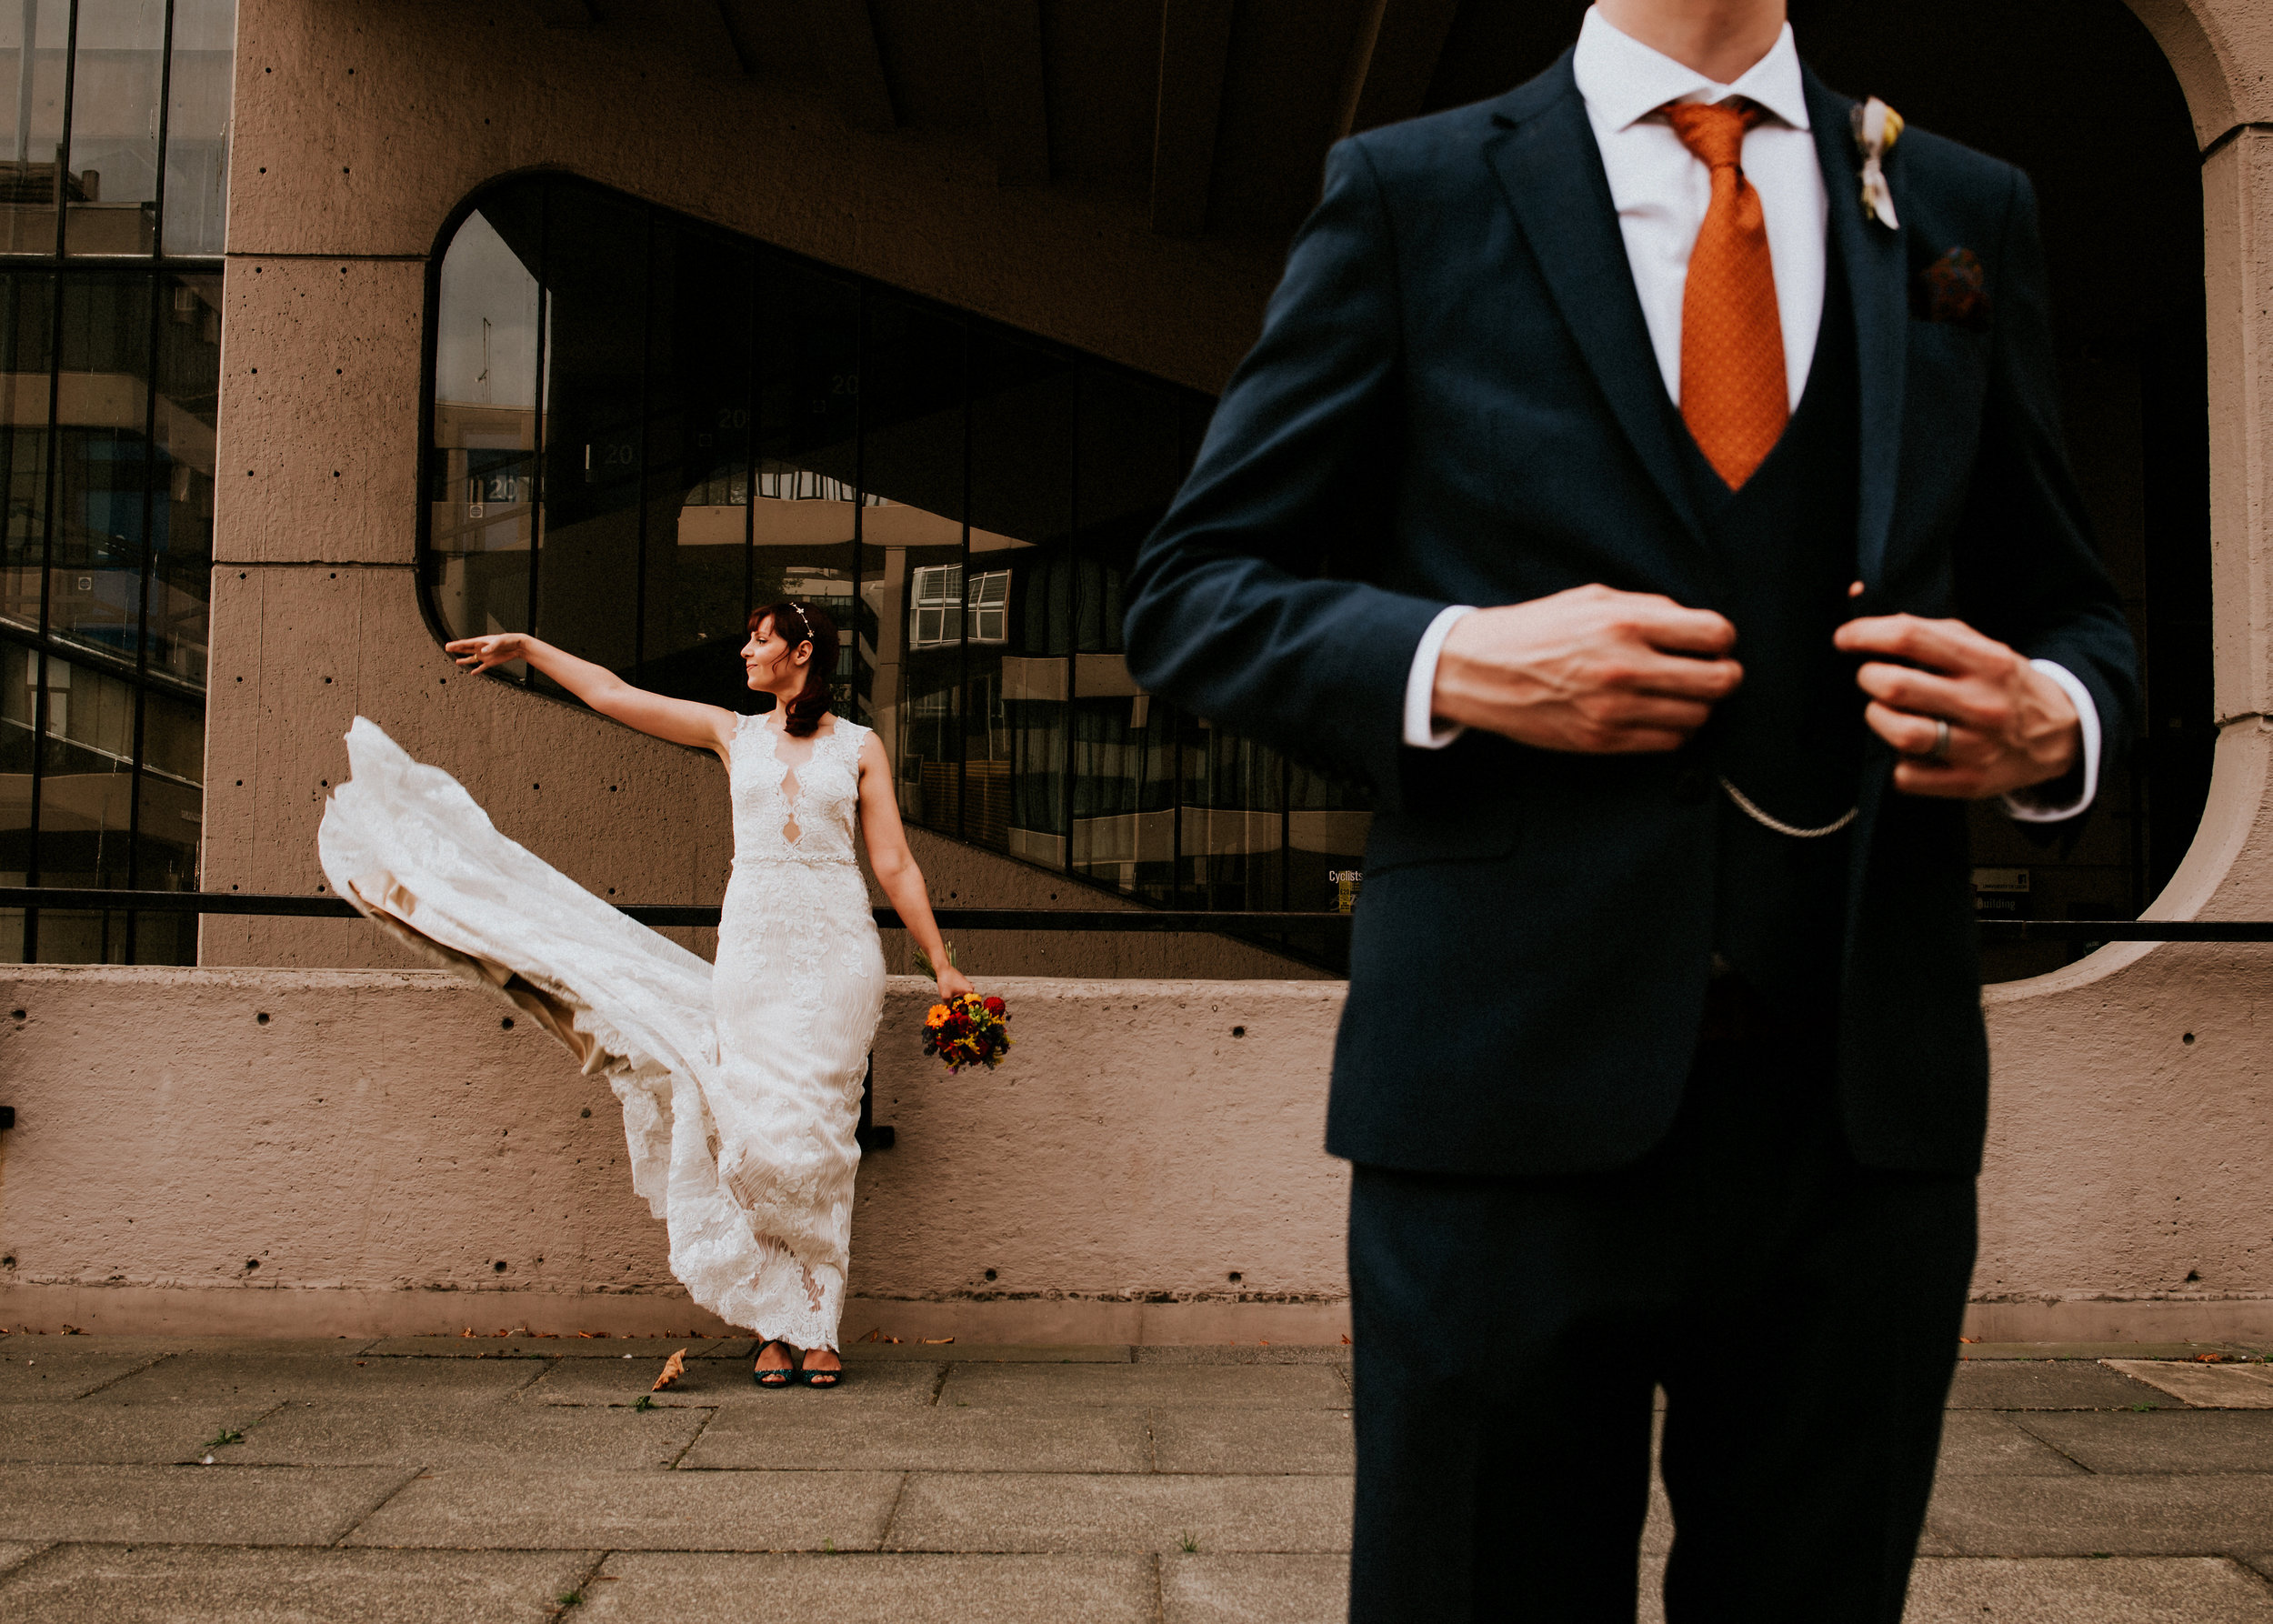 wind-caught-dress-wedding-photo-portrait-alternative-wedding-photographer-in-leeds-colourful-unique-photo.jpg